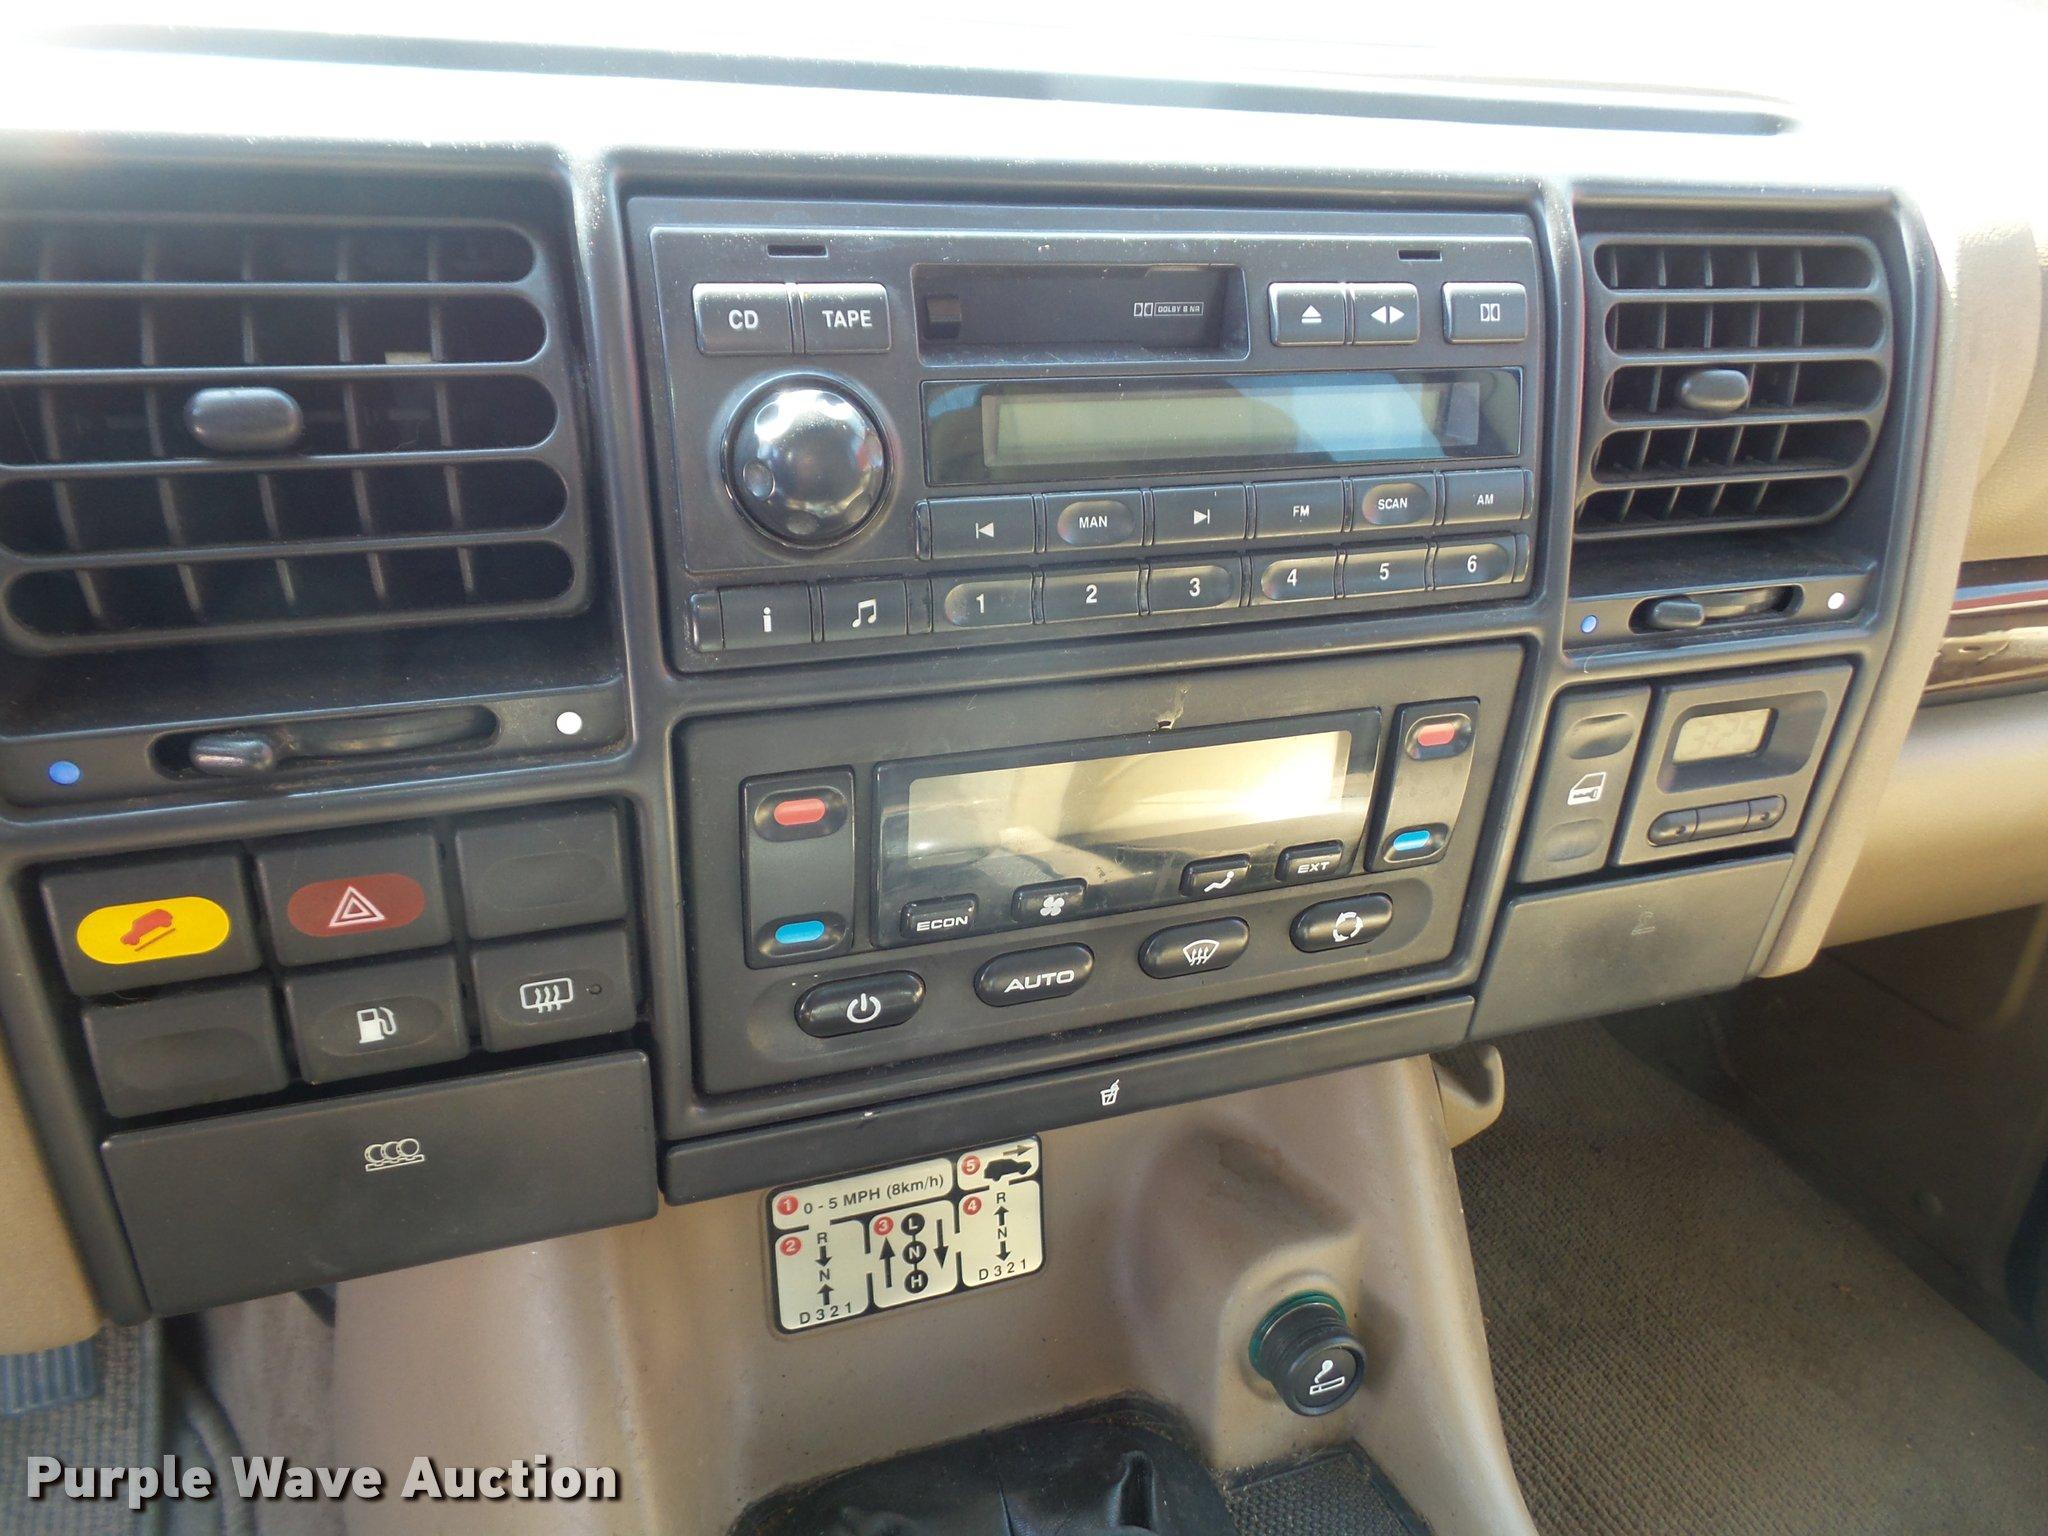 2000 Land Rover Discovery Series II SUV Item DA6308